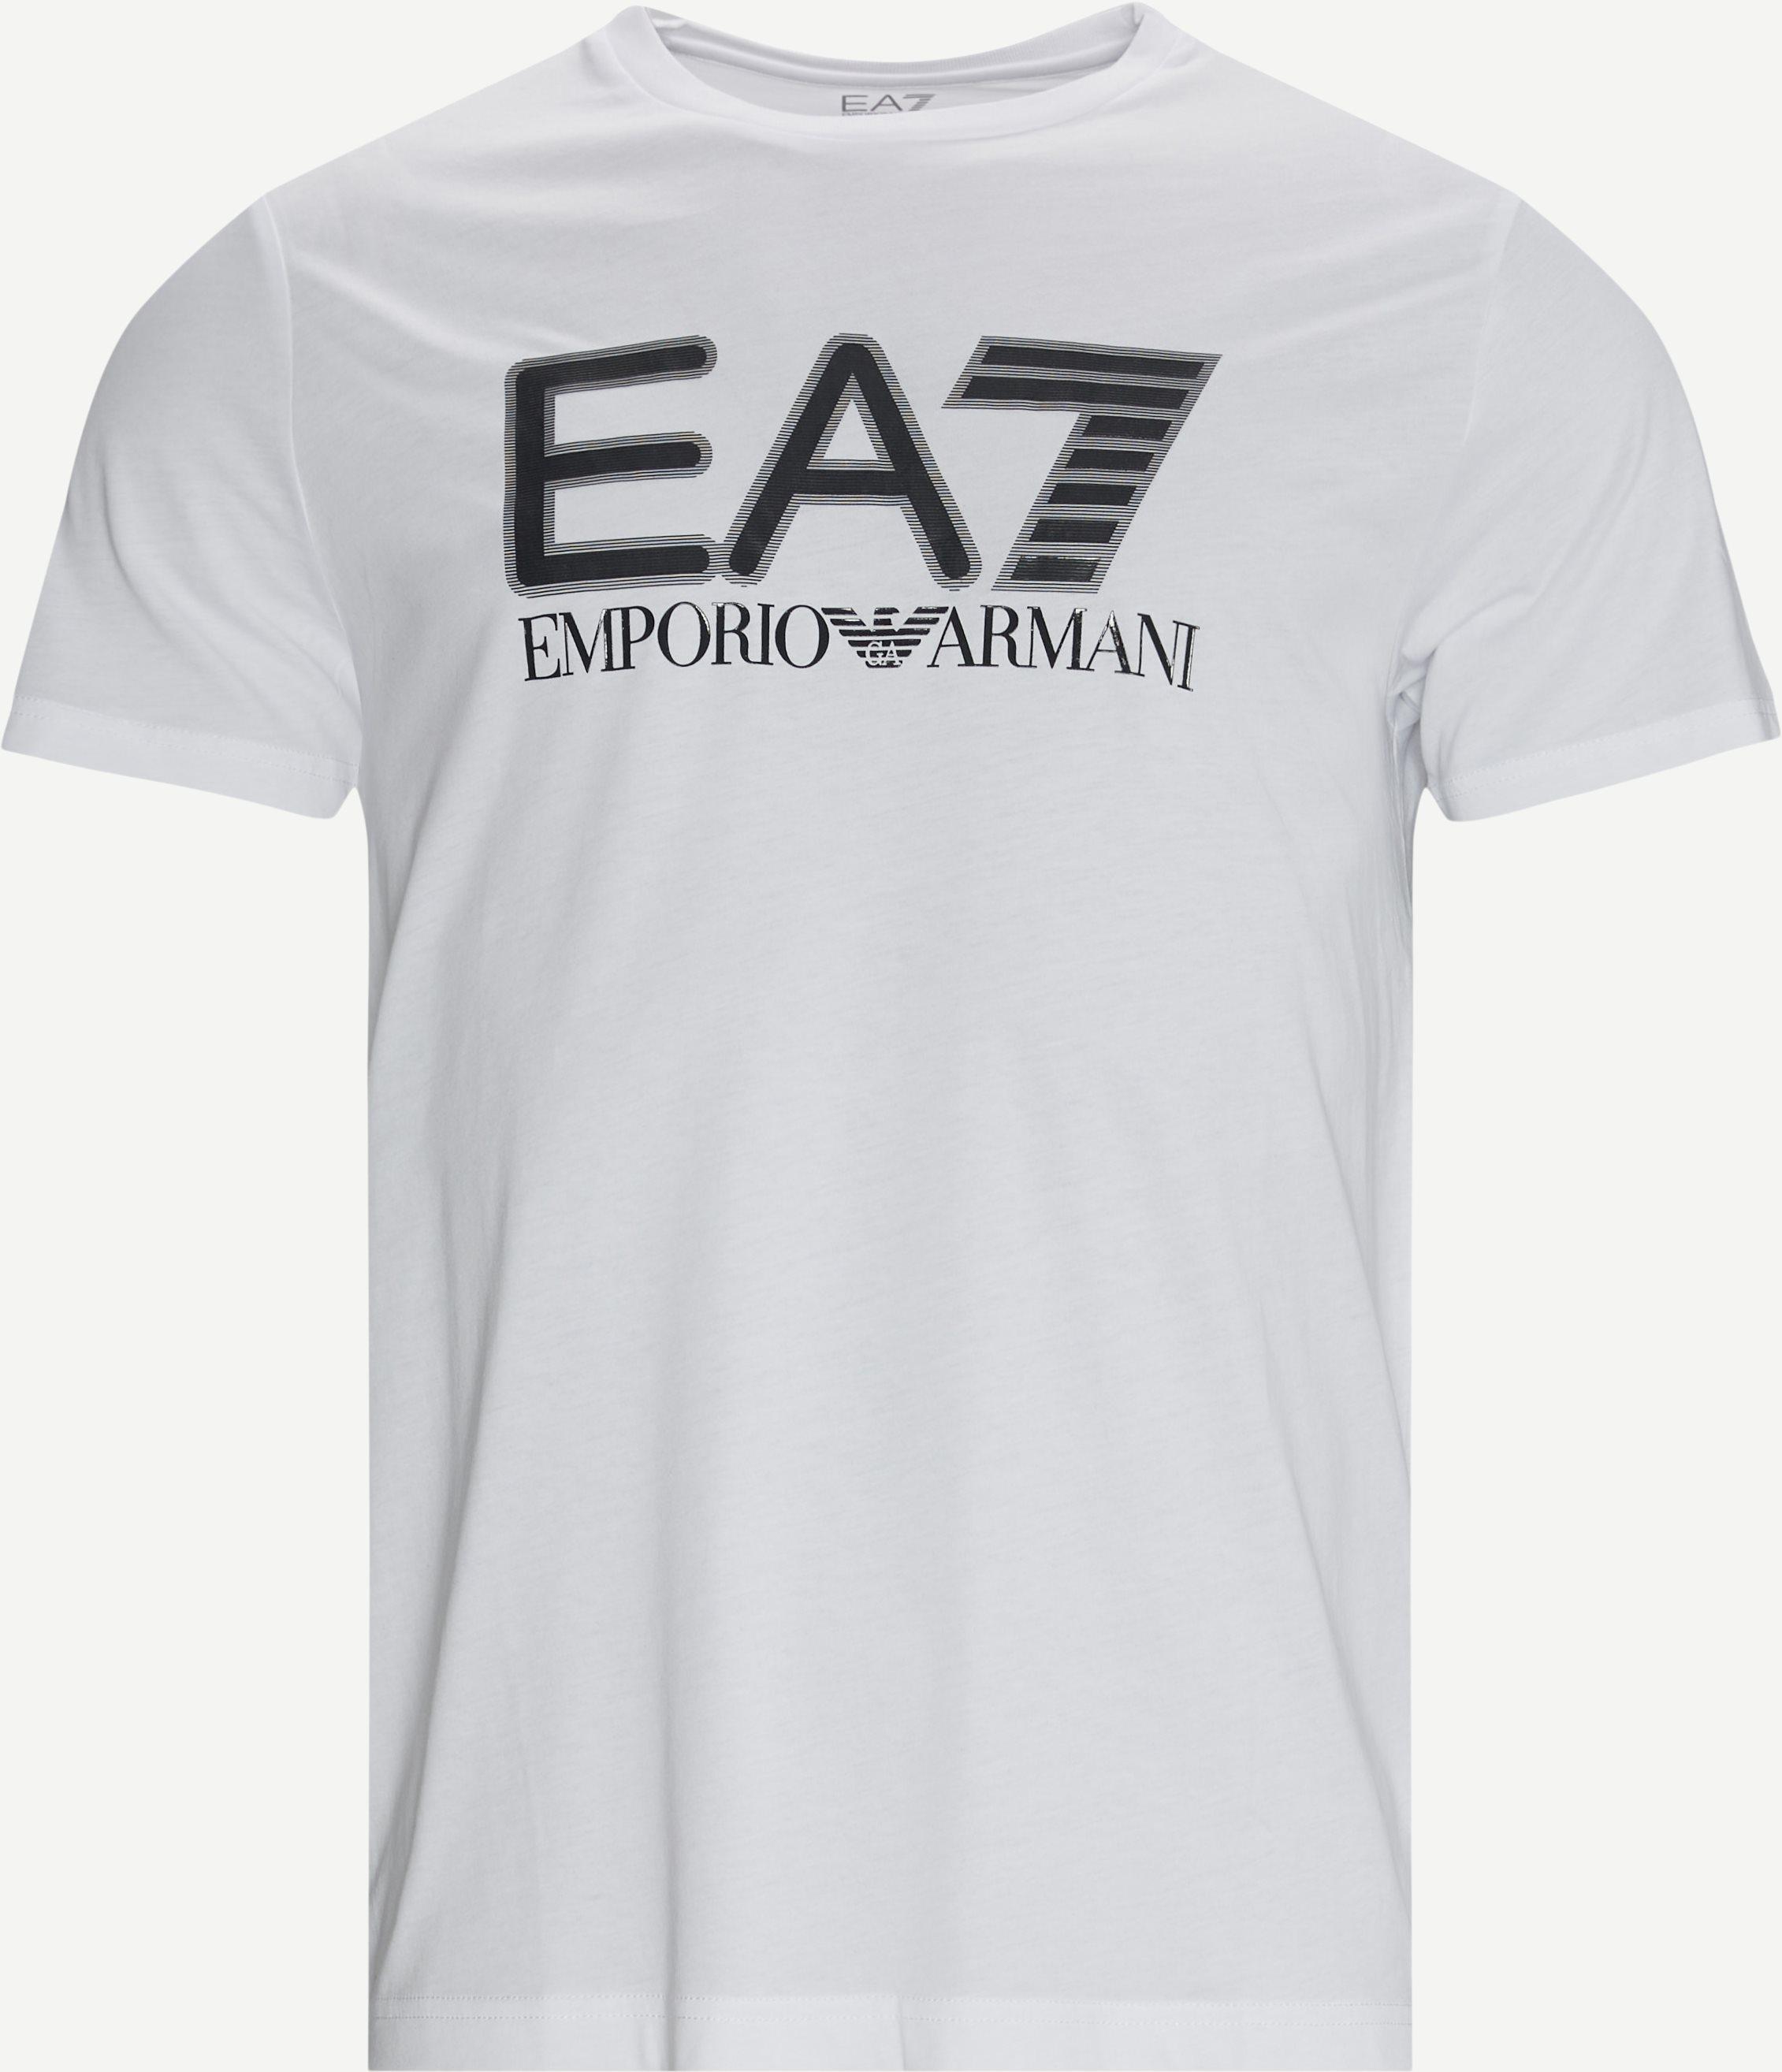 PJM9Z Logo T-shirt - T-shirts - Regular fit - Hvid